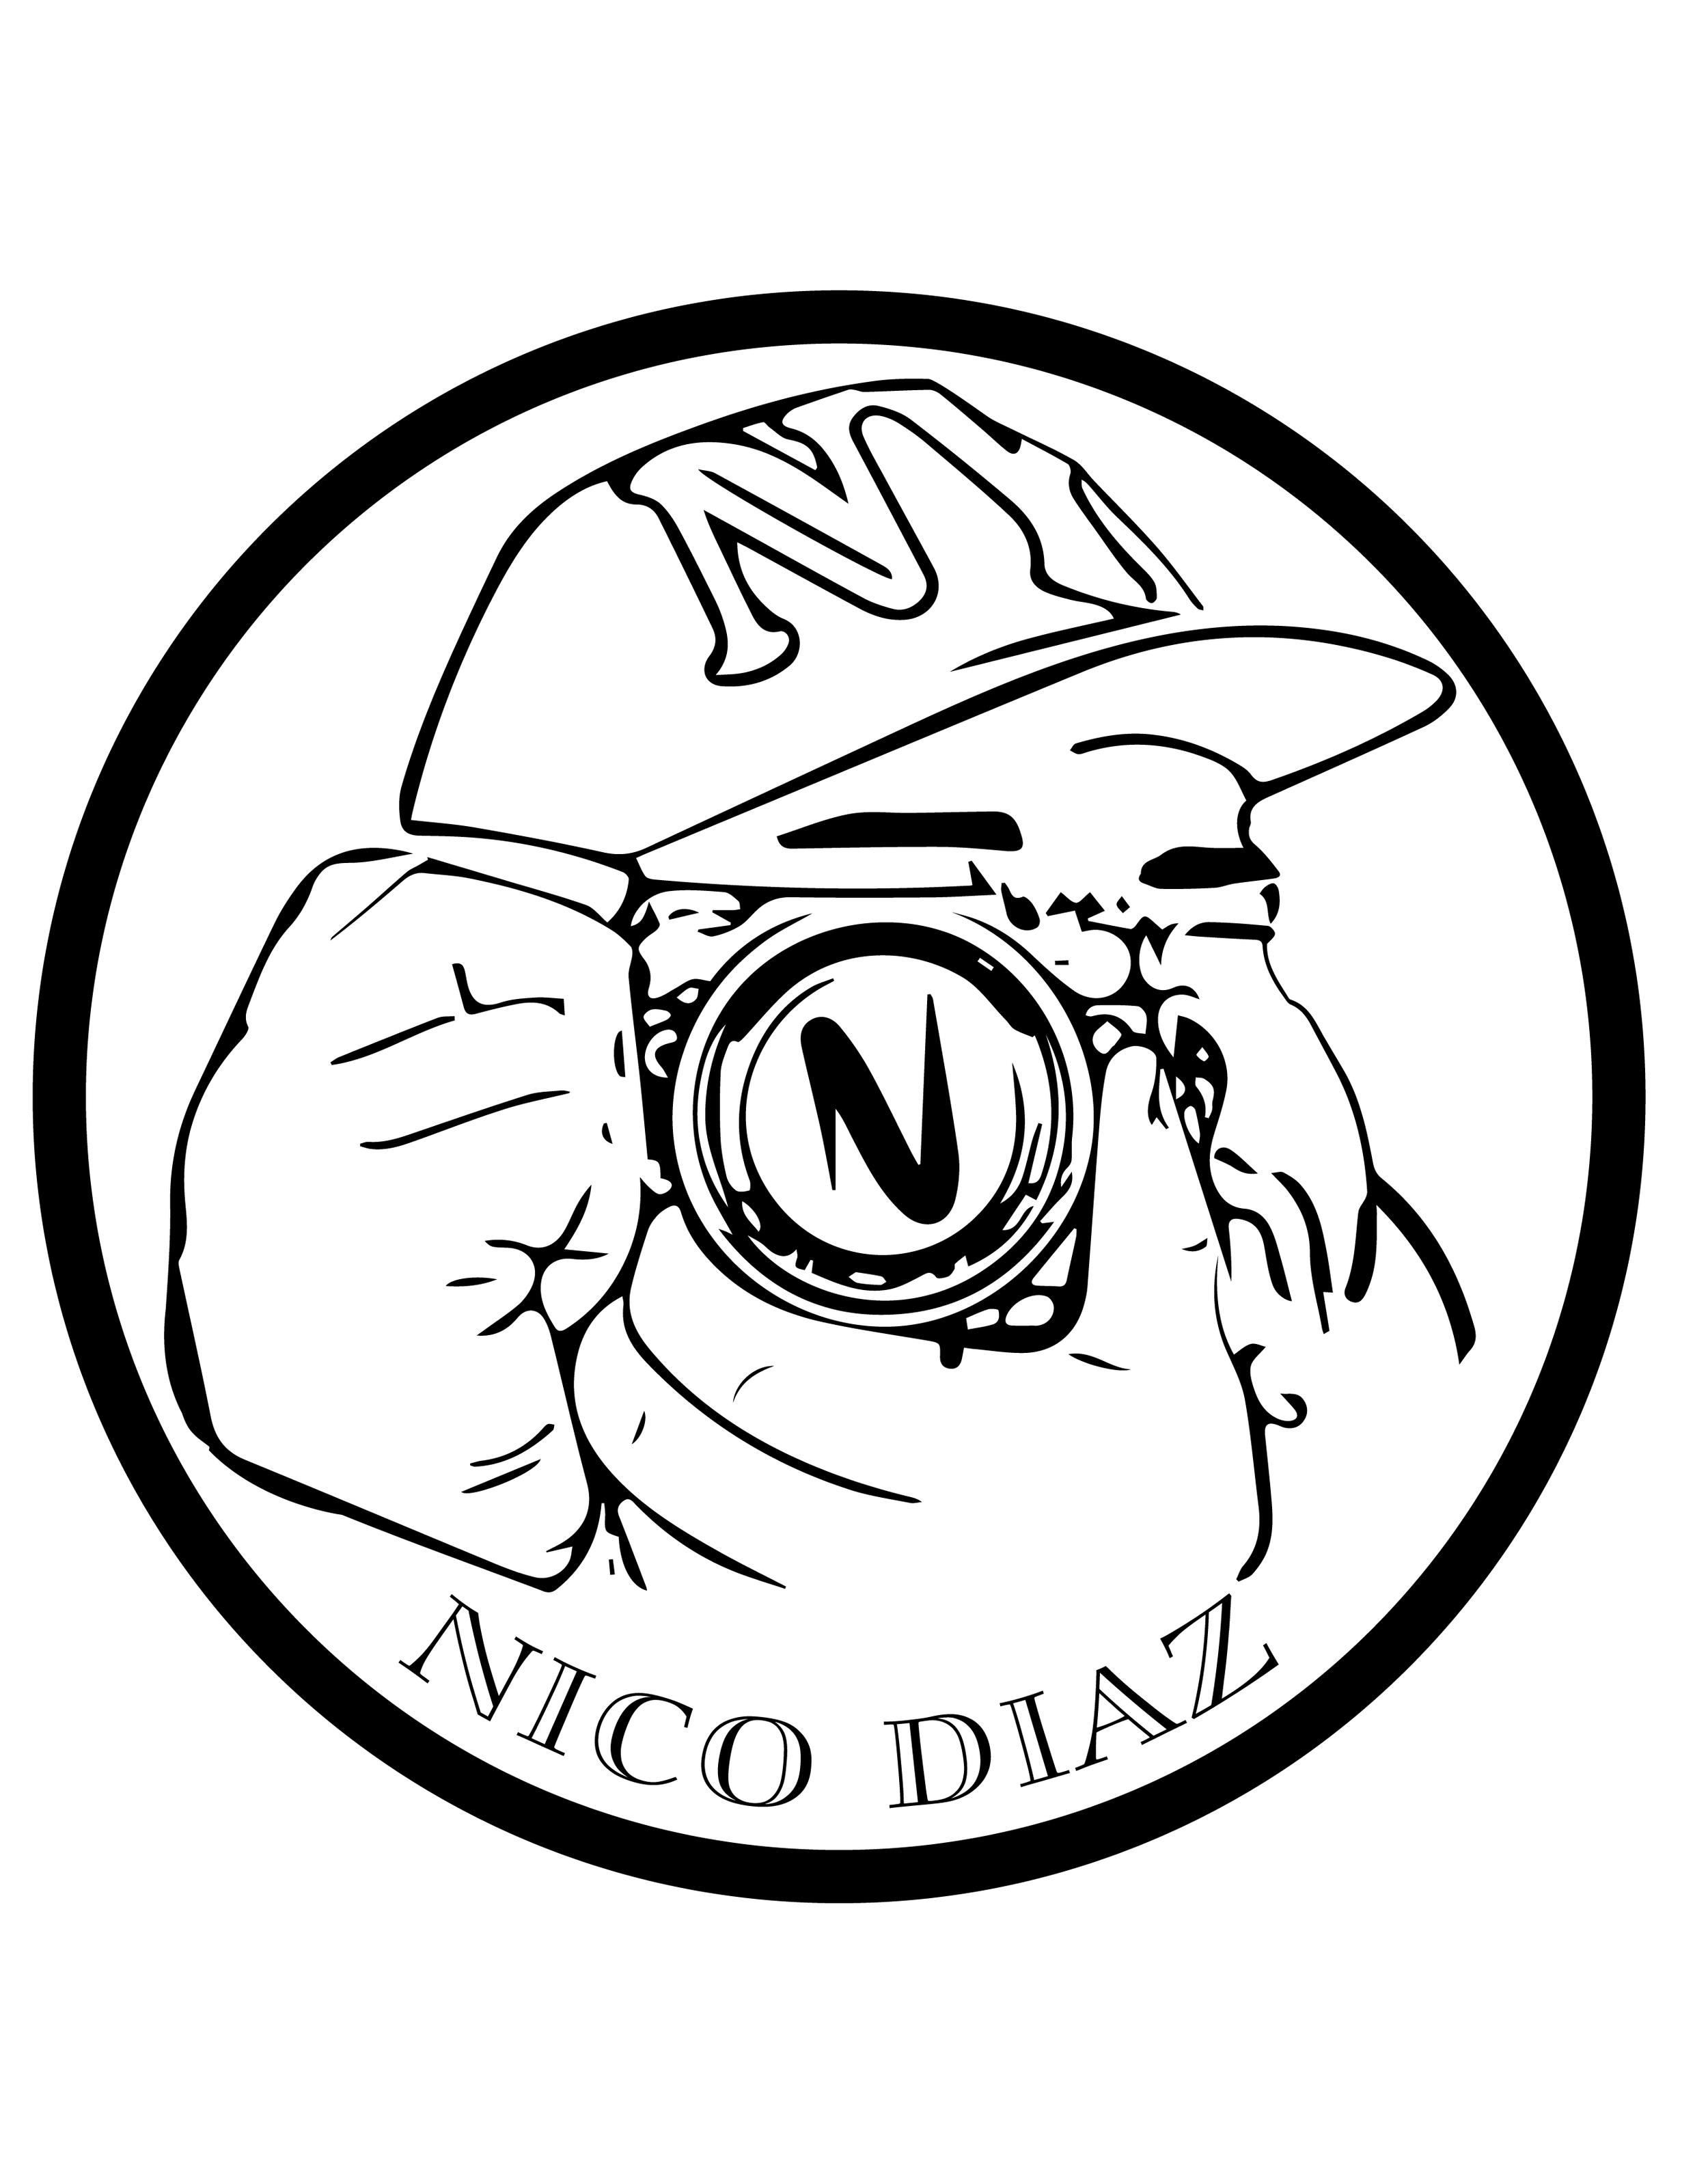 Nico Diaz Photography Logo